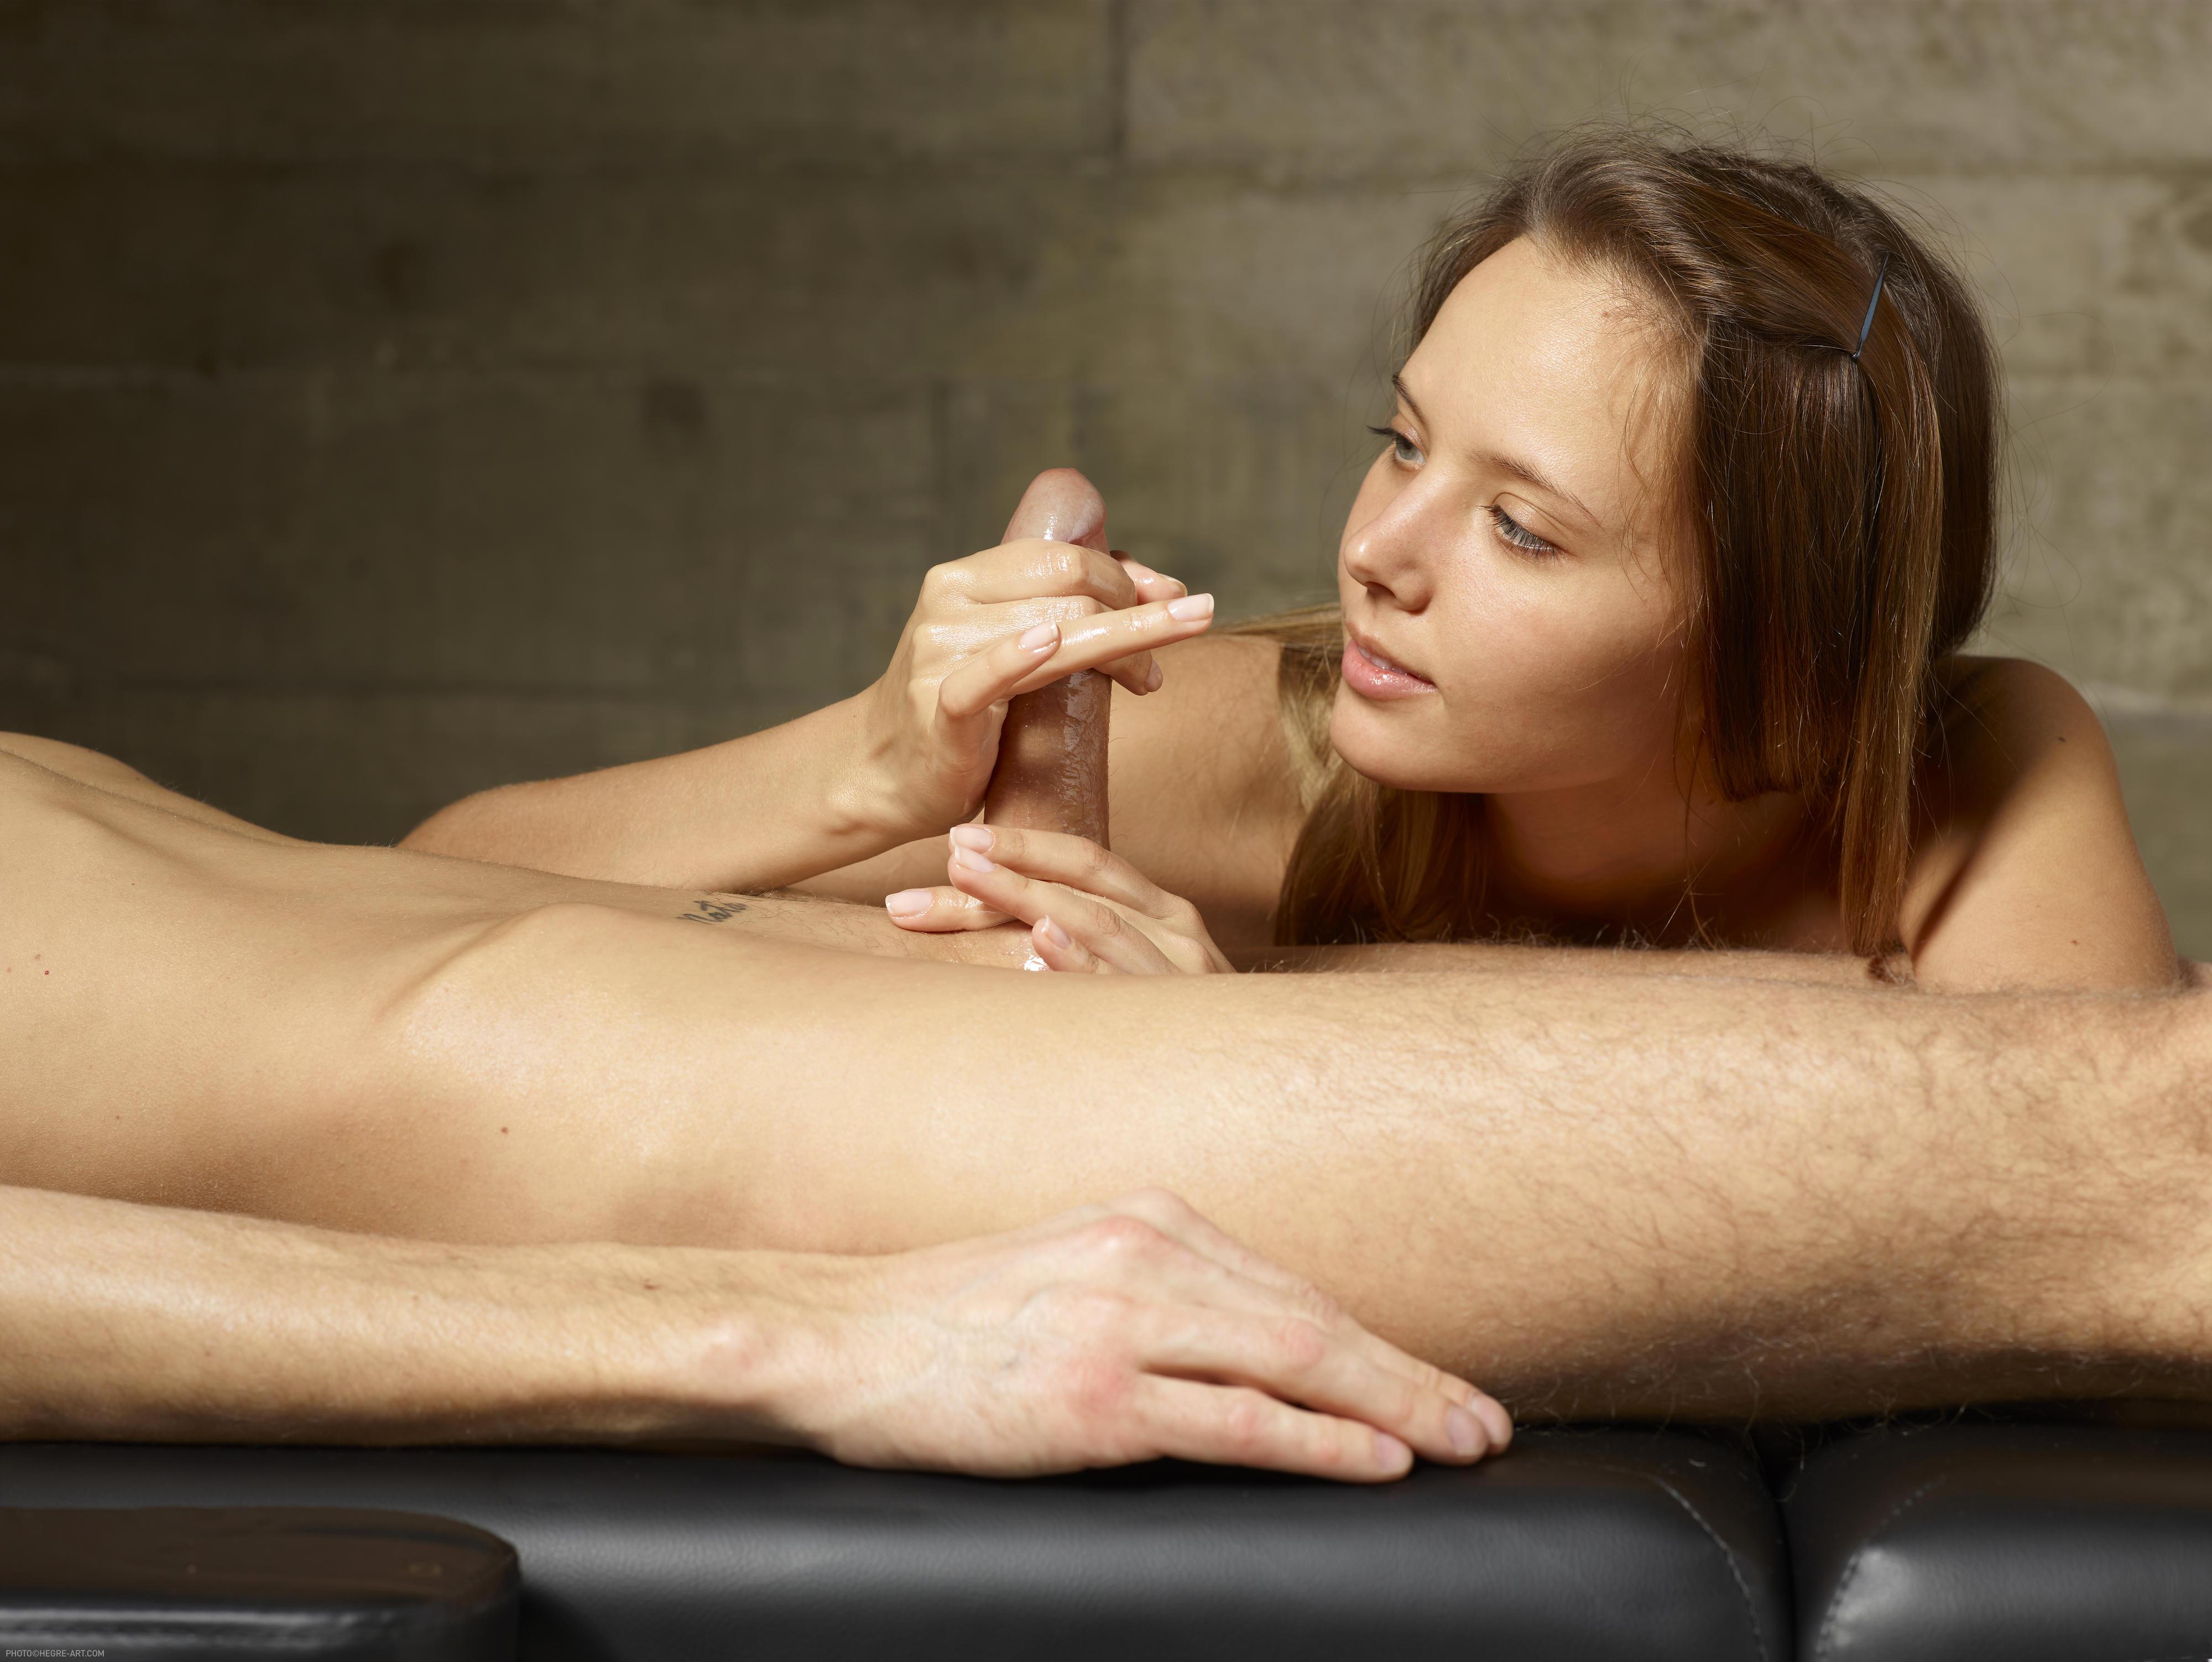 artistic nude blow job